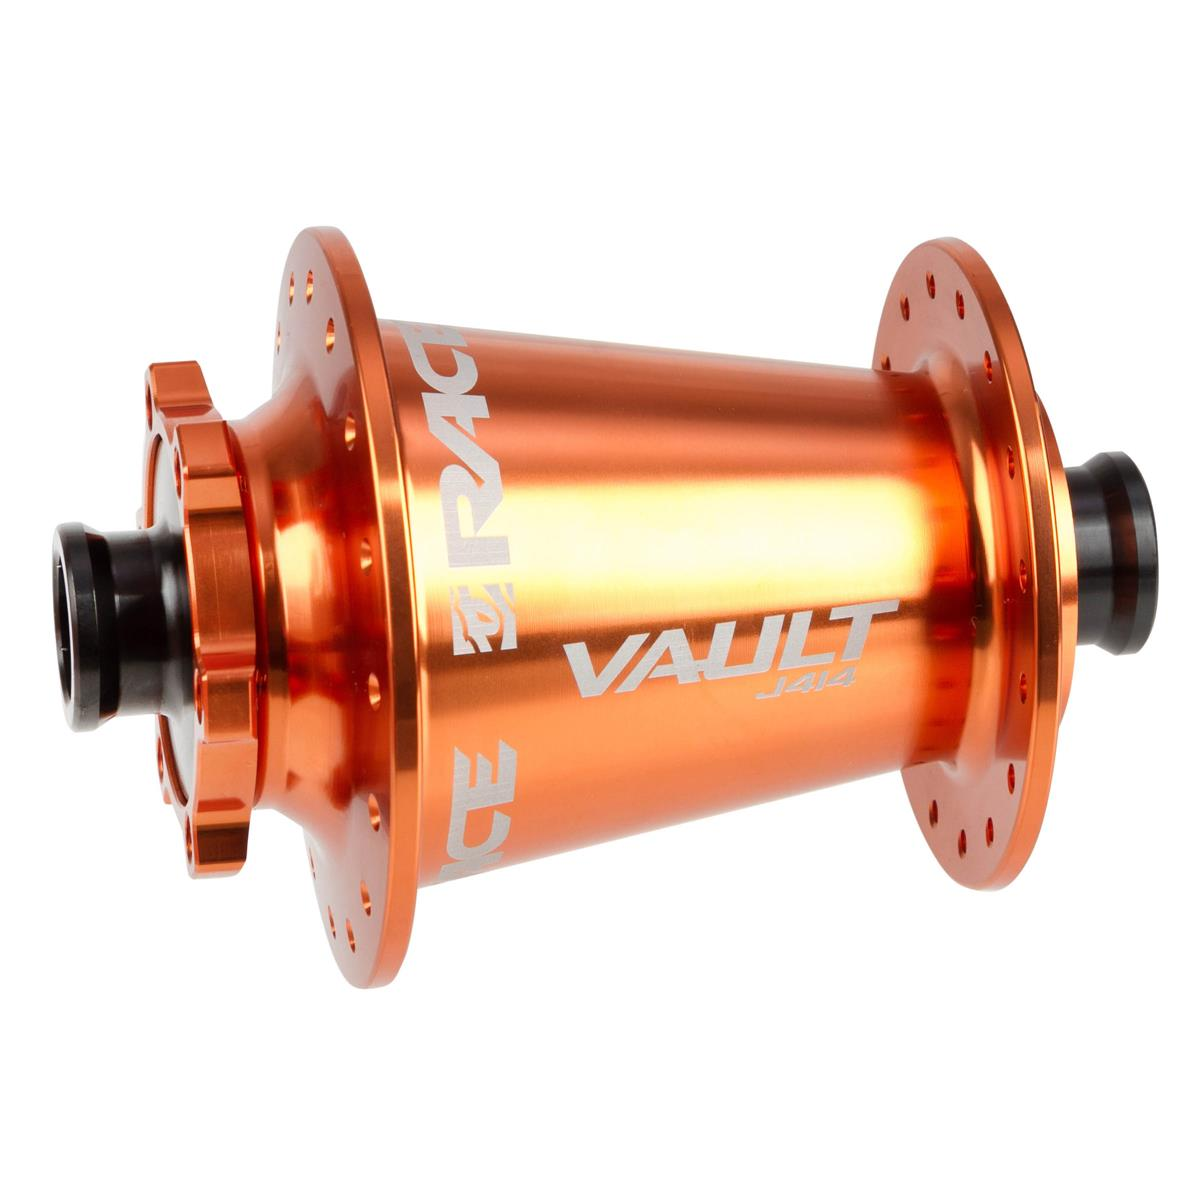 Race Face MTB-Nabe Vorderrad Vault 110 x 15 mm TA (Boost), Orange